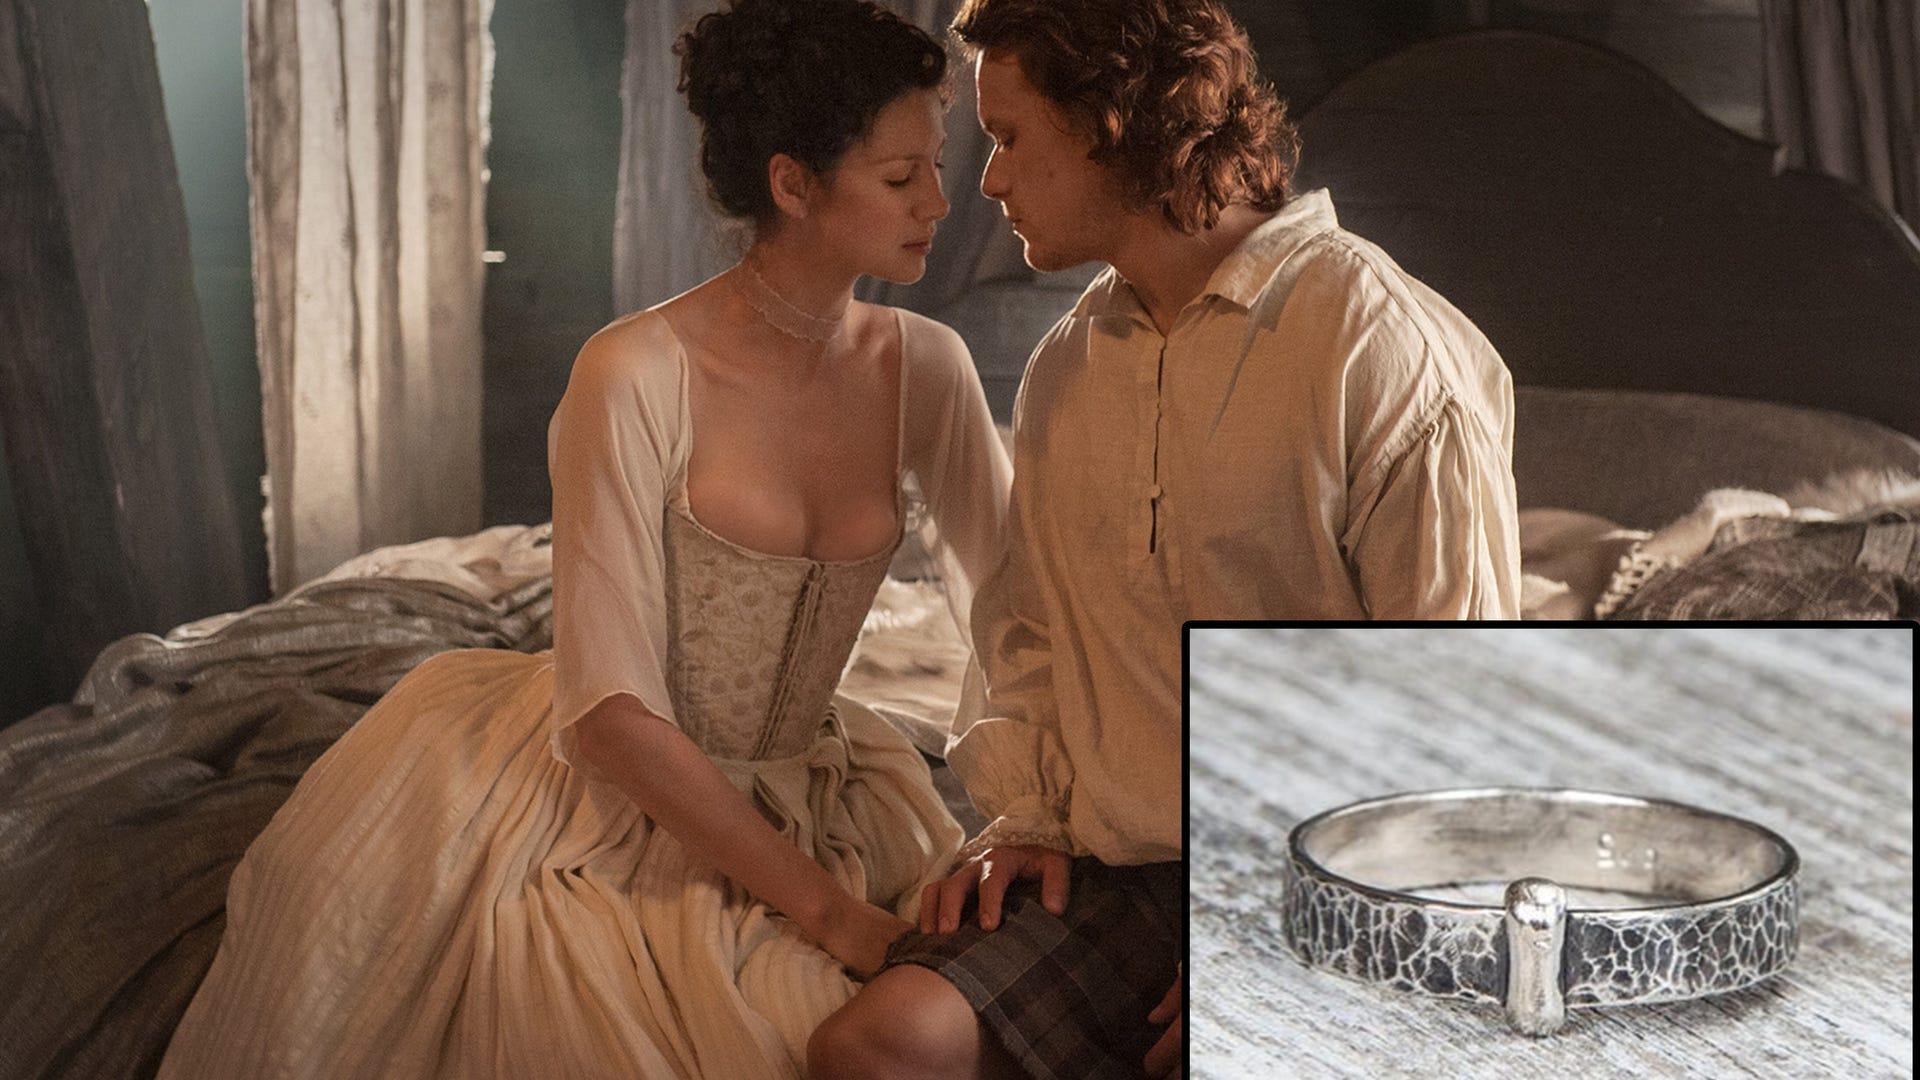 190128-valentine-day-gift-gallery-wedding-ring-outlander.jpg